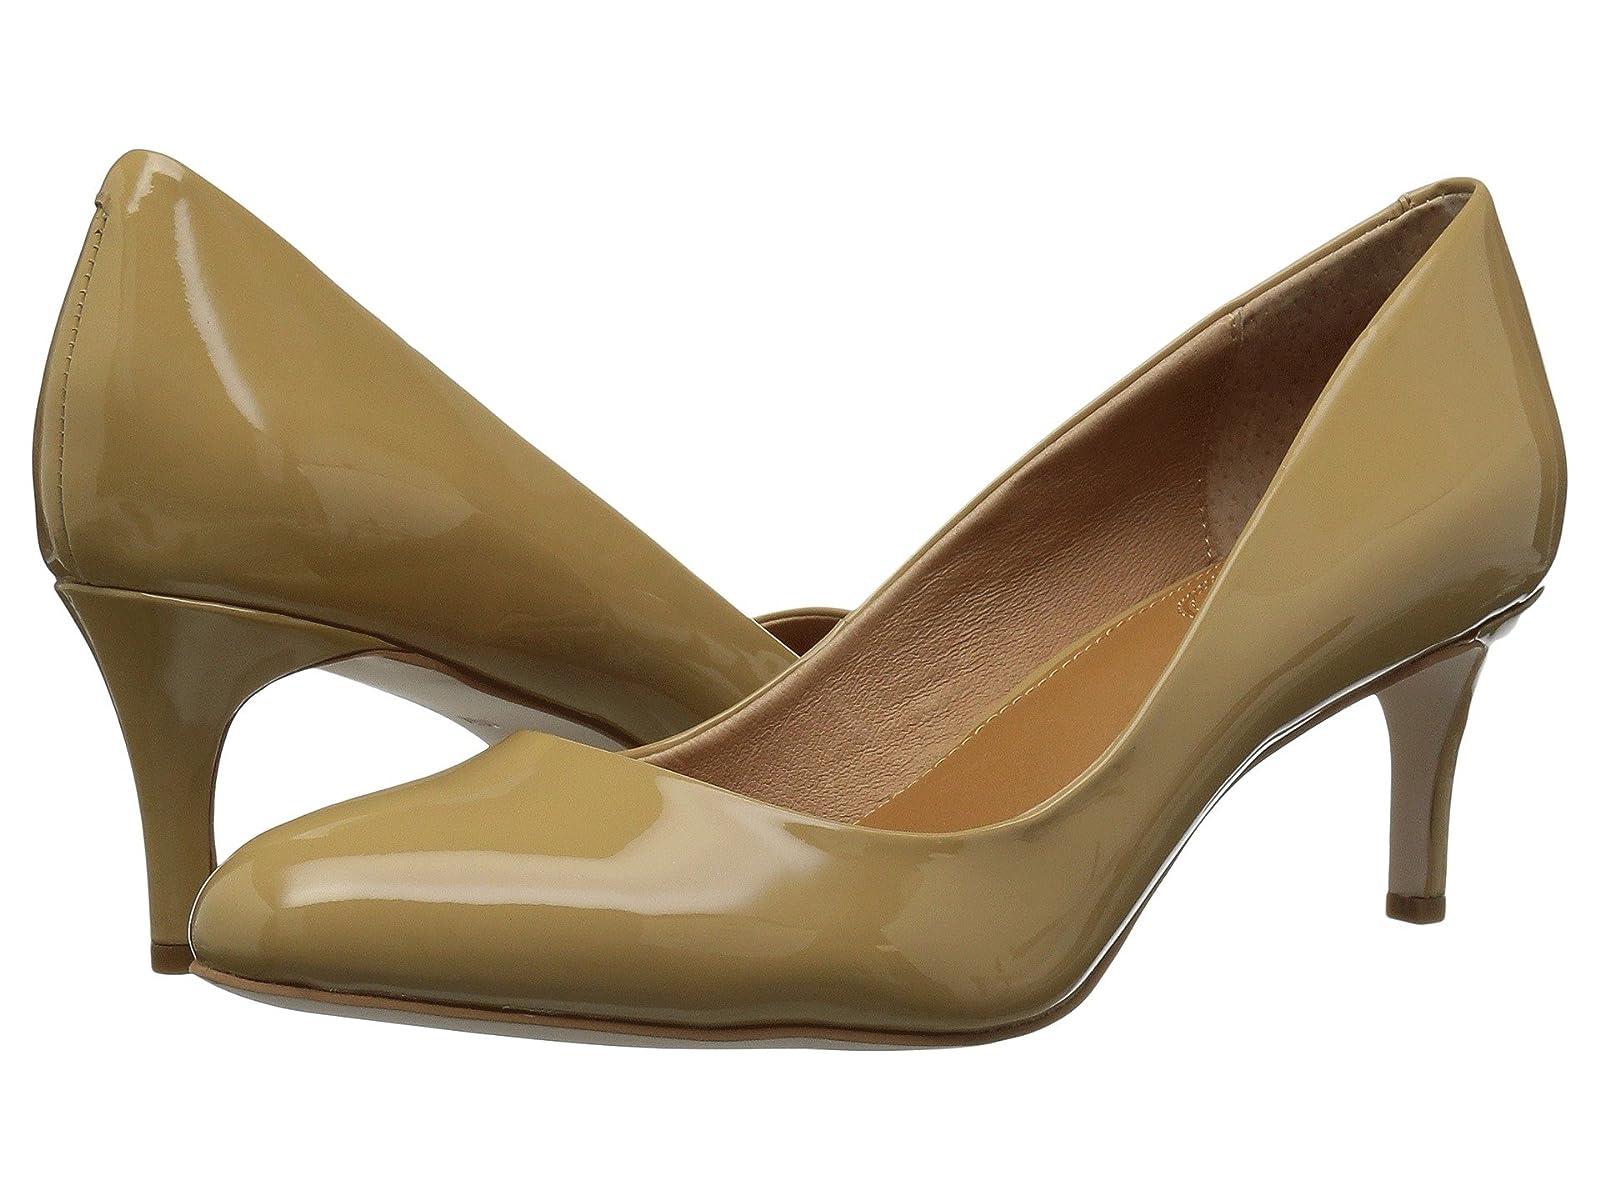 CC Corso Como LinndenAtmospheric grades have affordable shoes